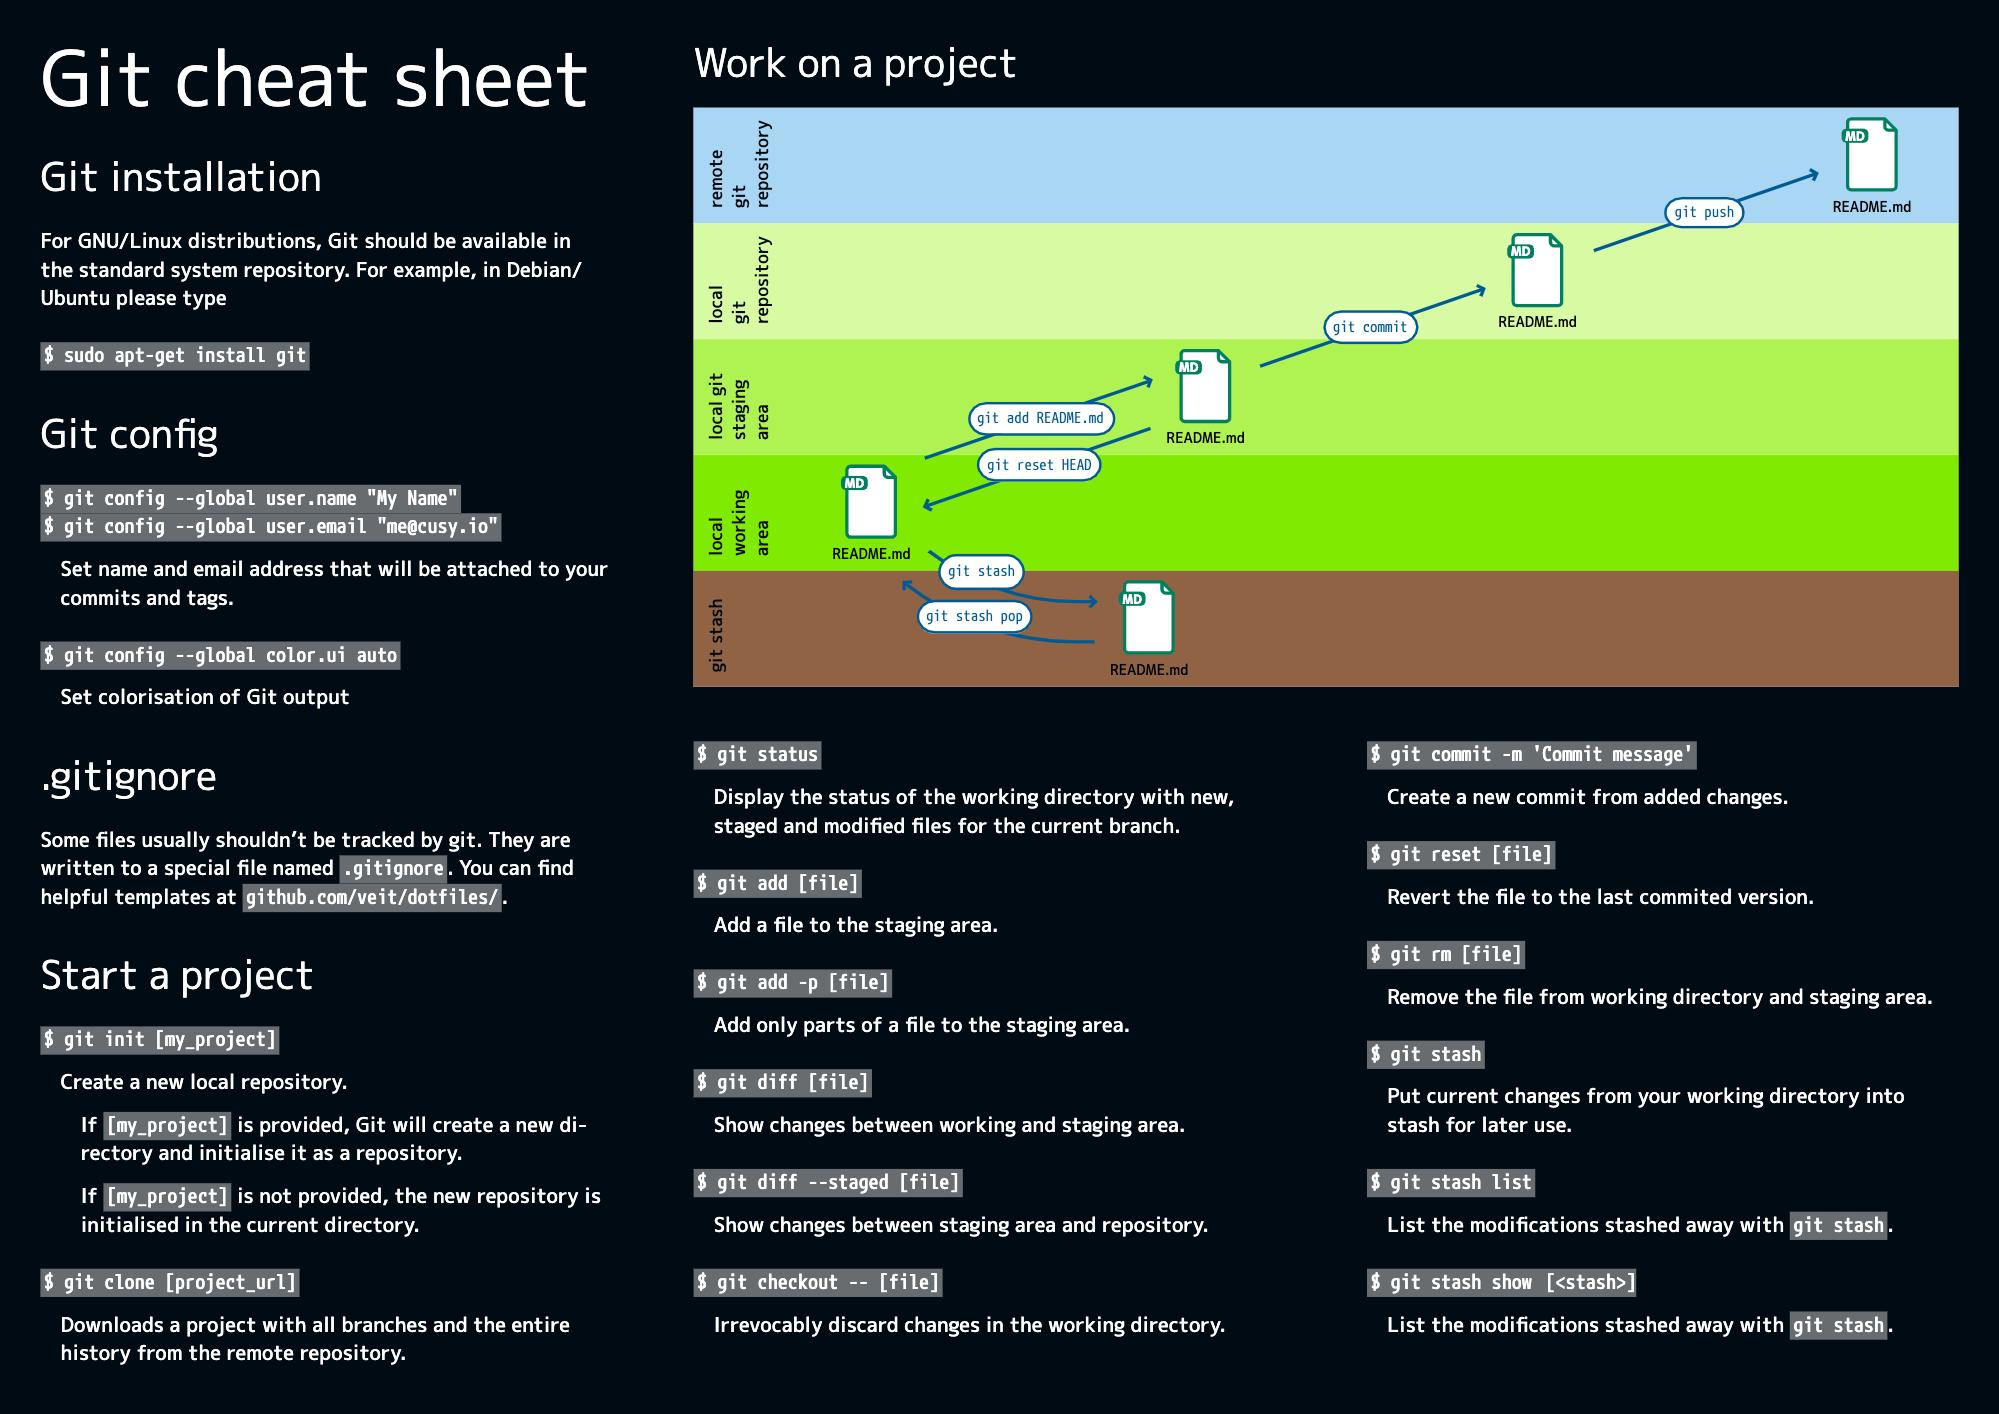 git-cheat-sheet.png